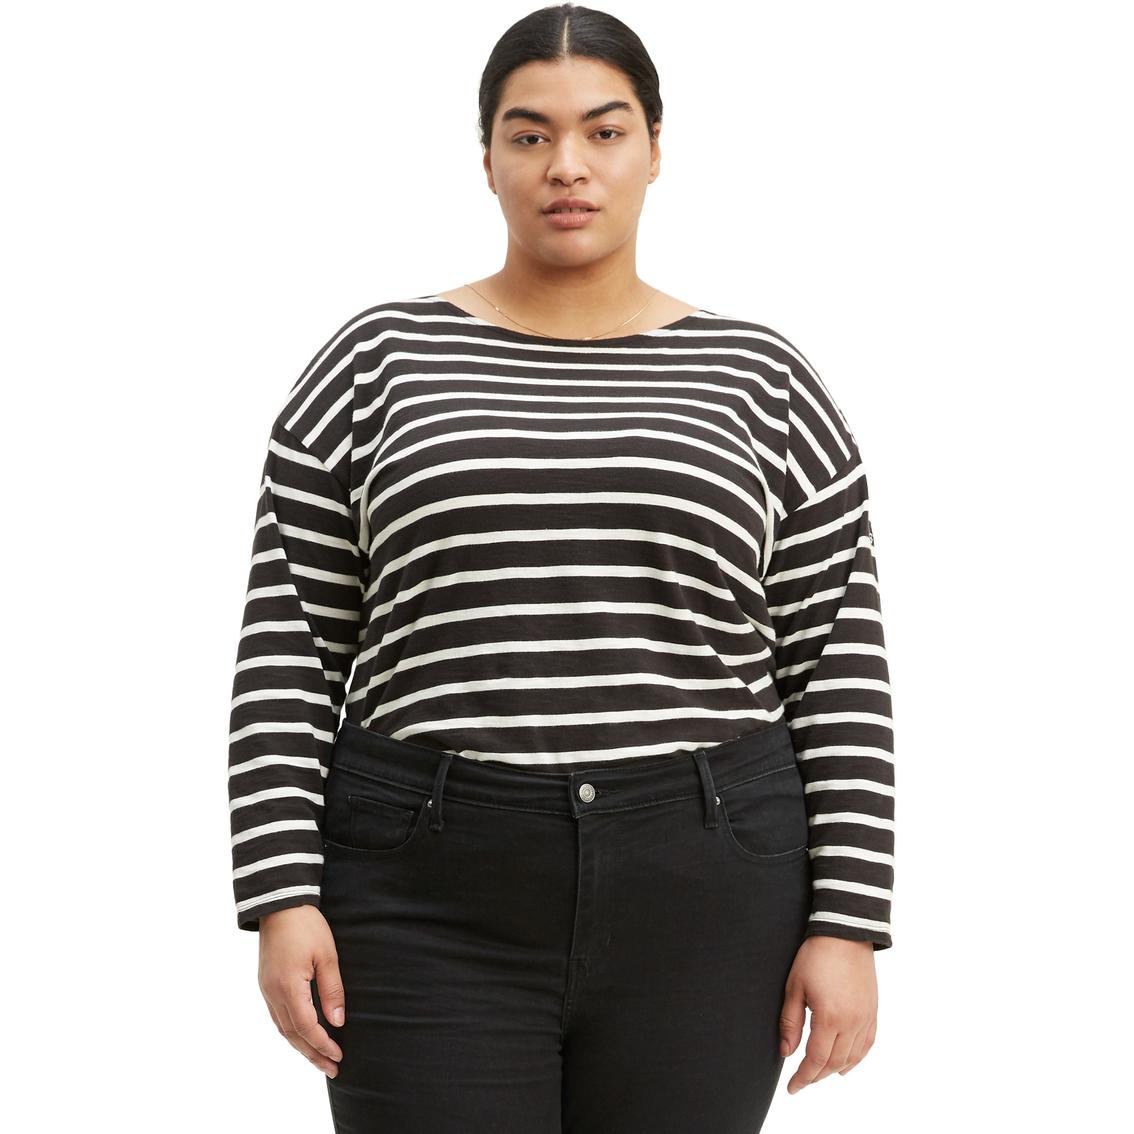 Levi\'s Plus Size Cora Sailor Tee | T-shirts | Clothing ...